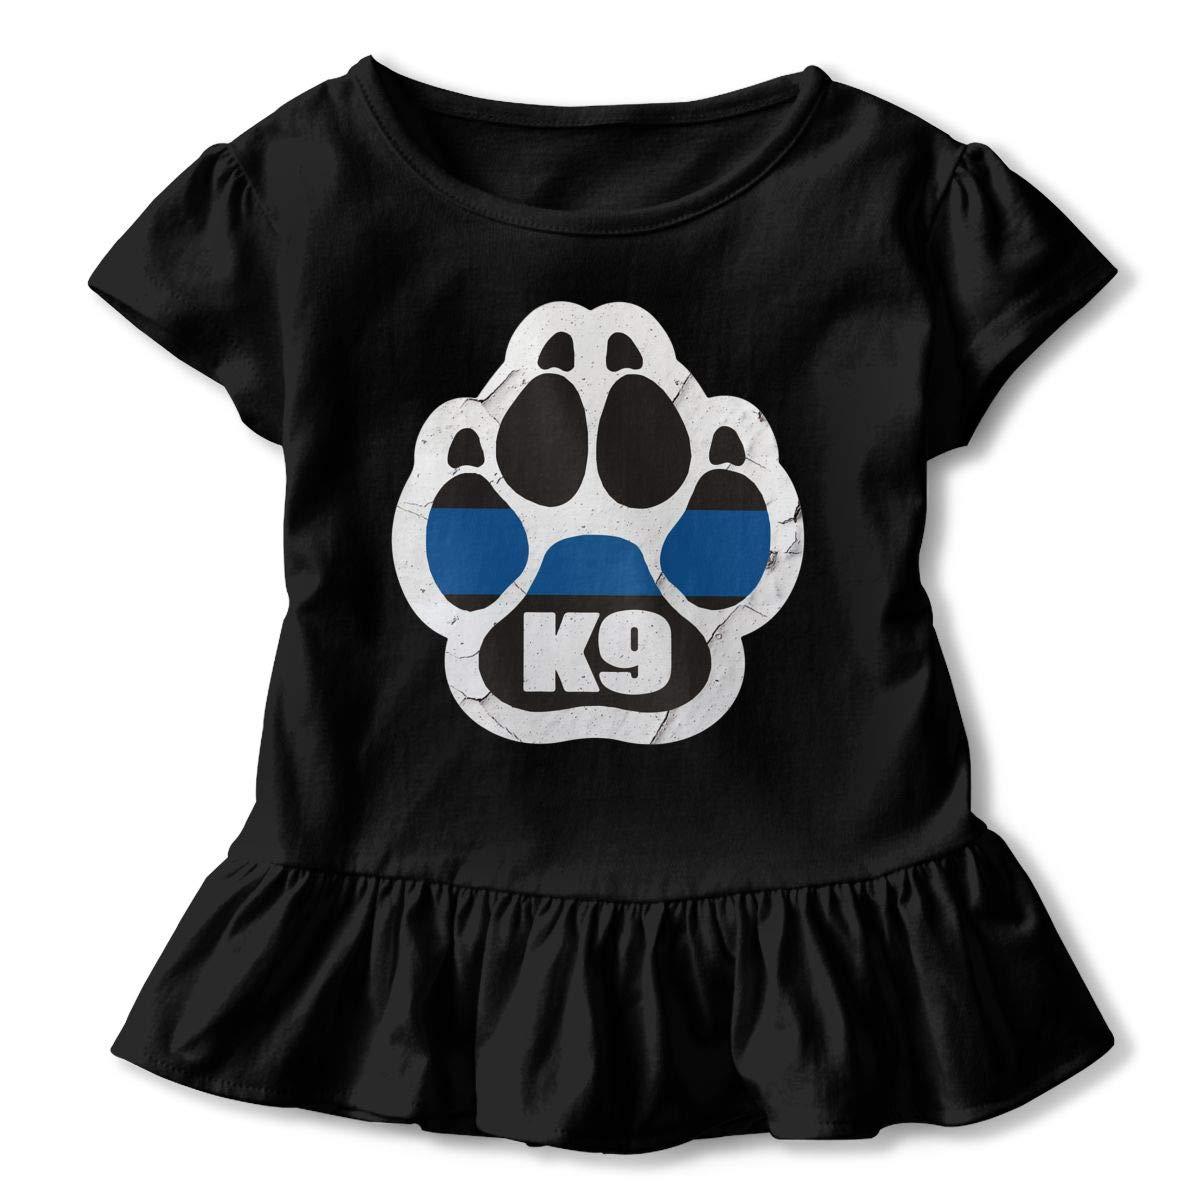 K 9 Unit Thin Blue Line Paw Toddler Girls T Shirt Kids Cotton Short Sleeve Ruffle Tee